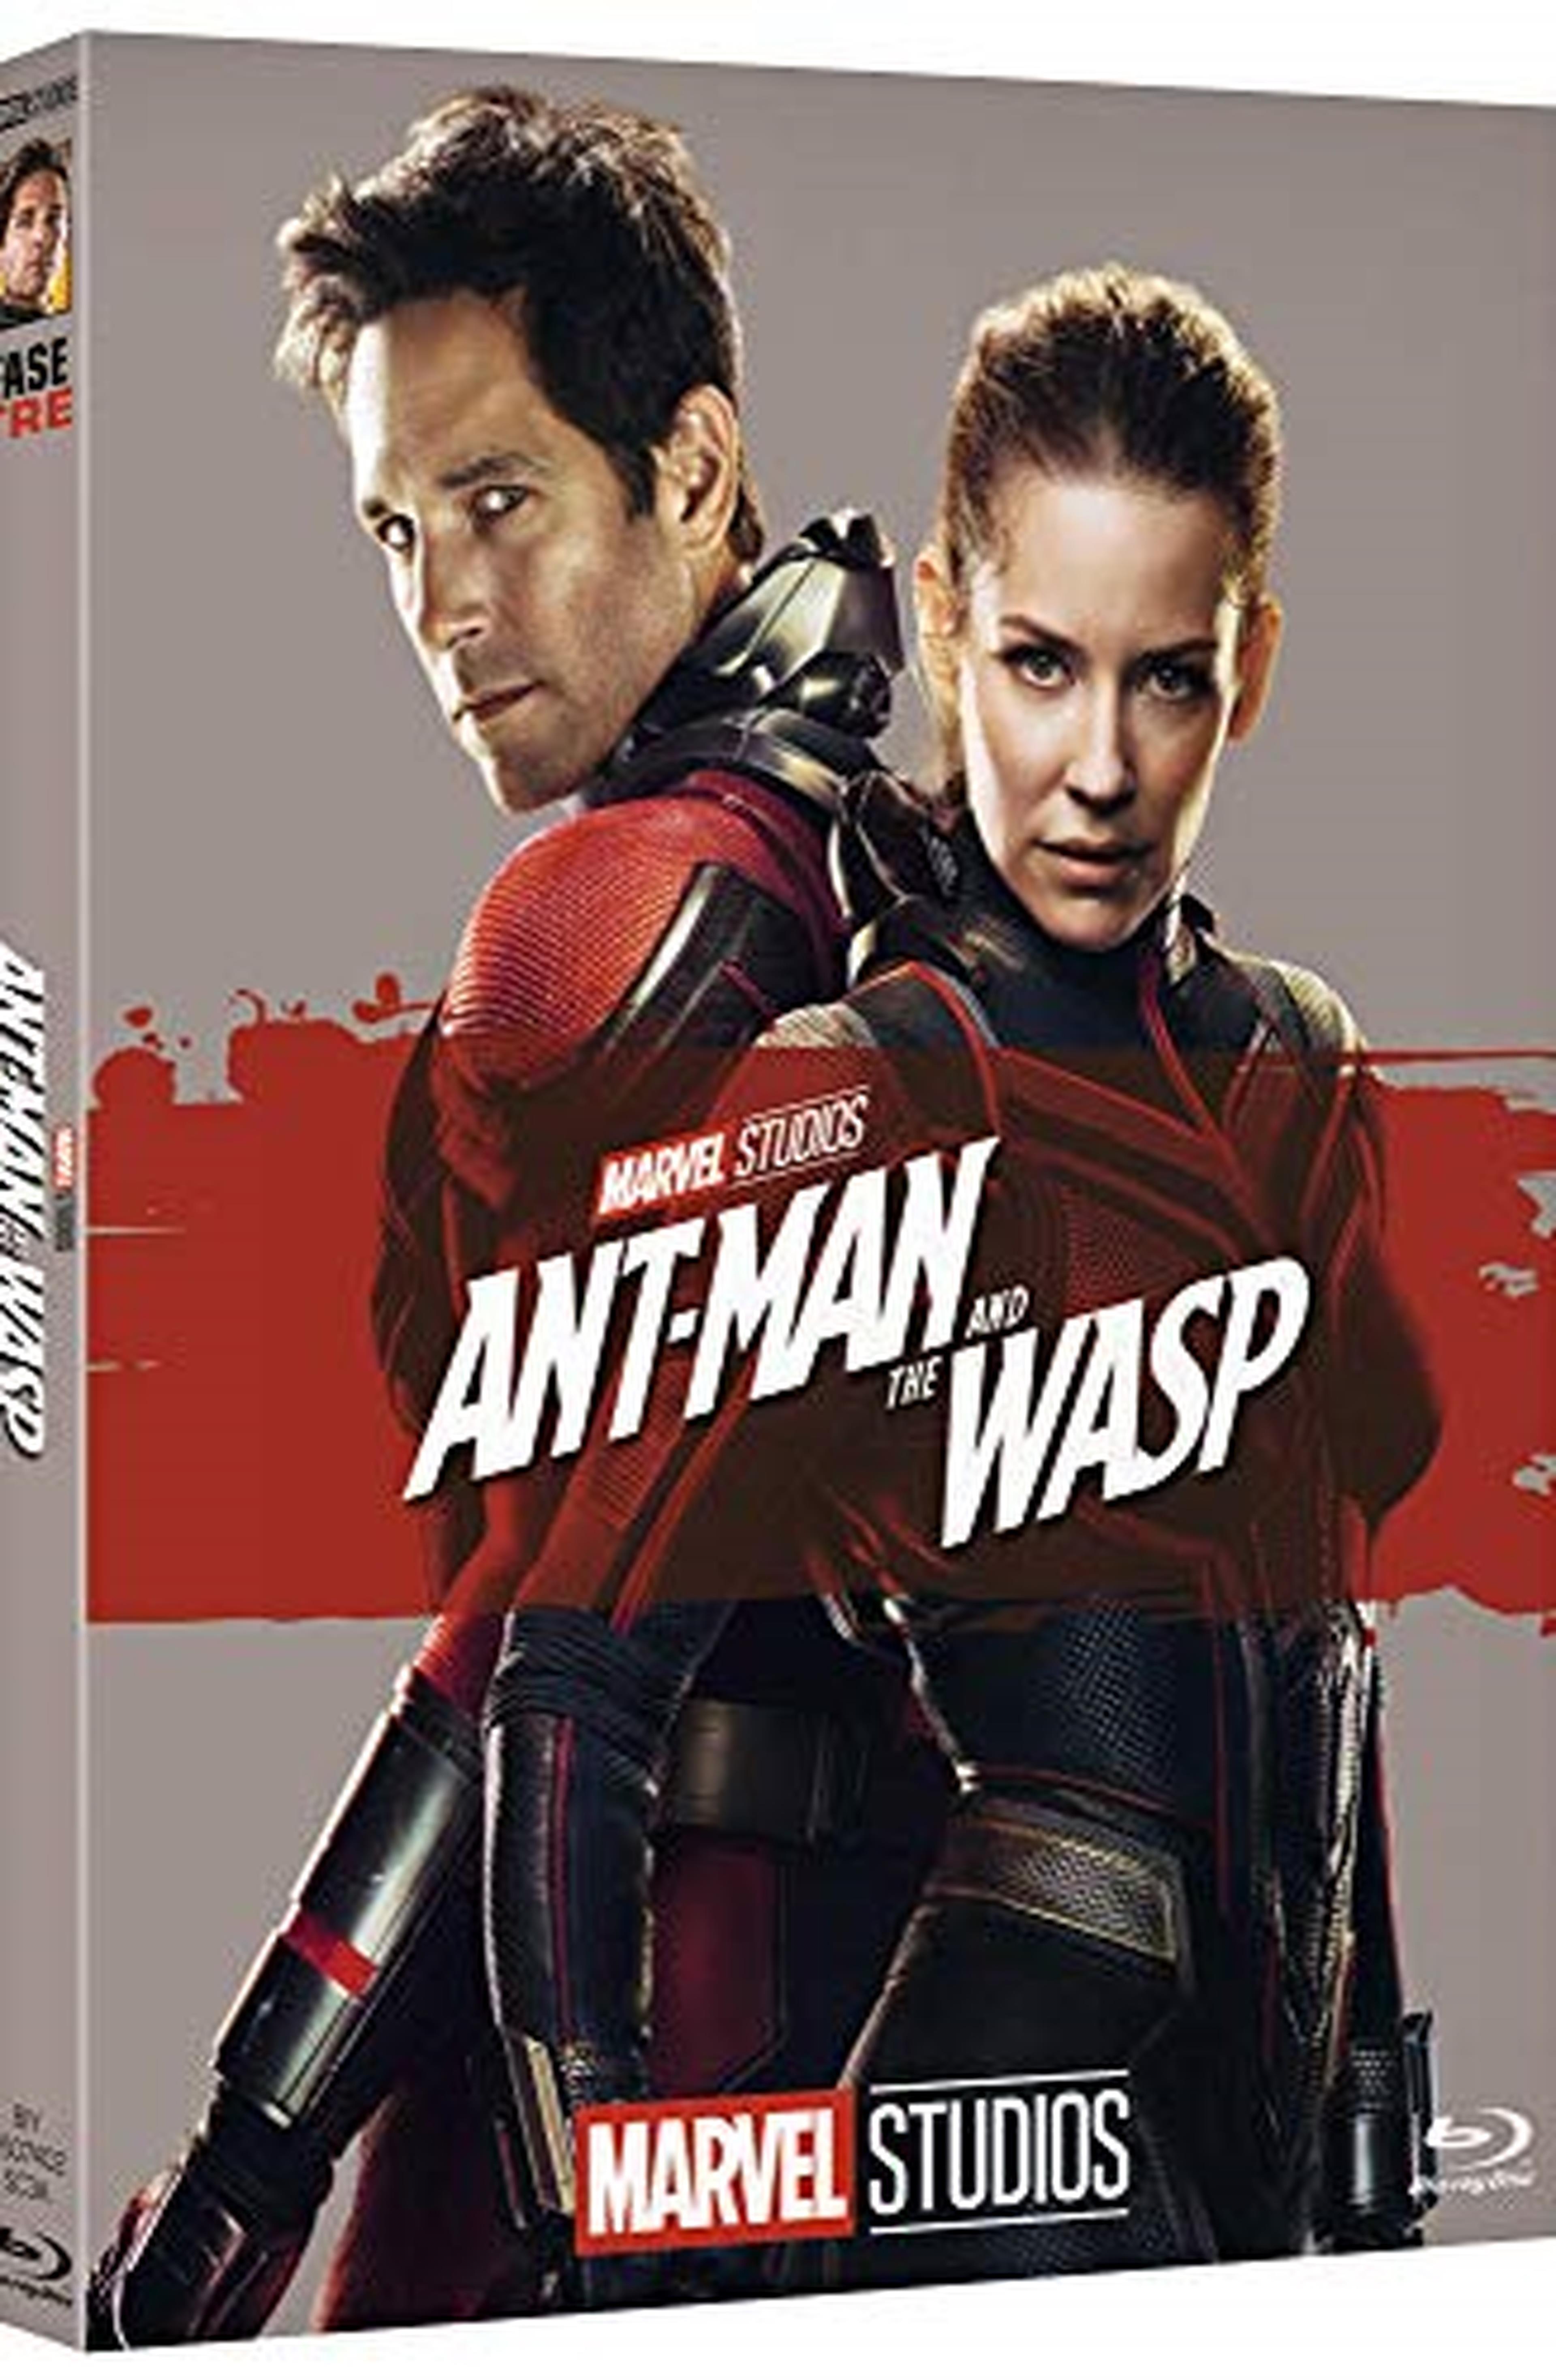 Ant-Man & The Wasp 10° Anniversario Marvel Studios brd ( Blu Ray)